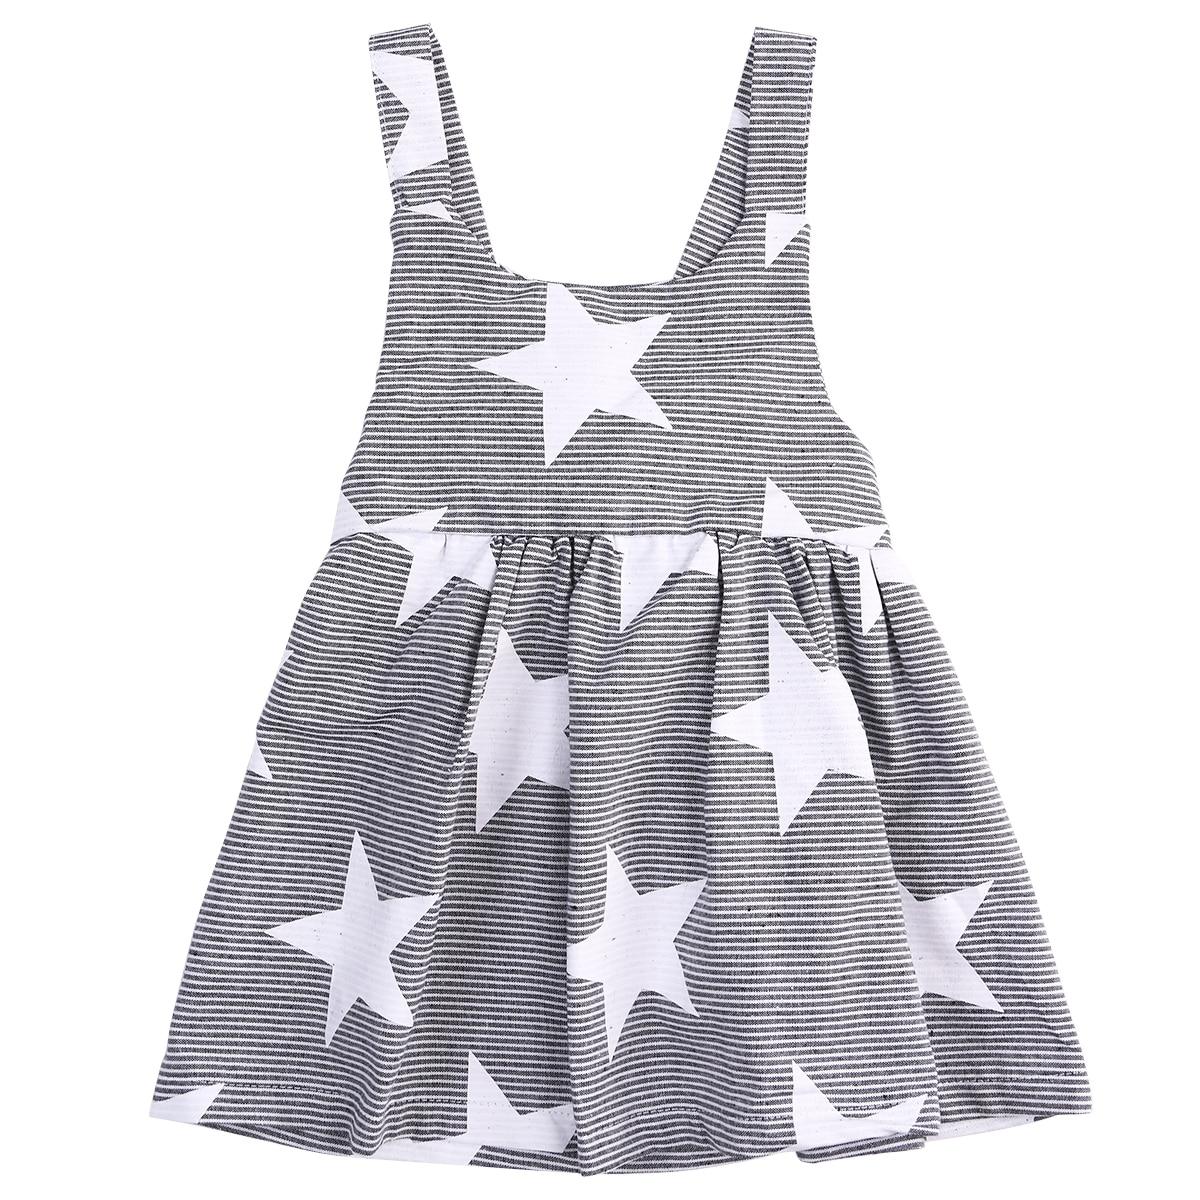 girls dresses summer 2016 Baby kids Girls Summer Sleeveless Beach Sundress Star Stripe Party Dress